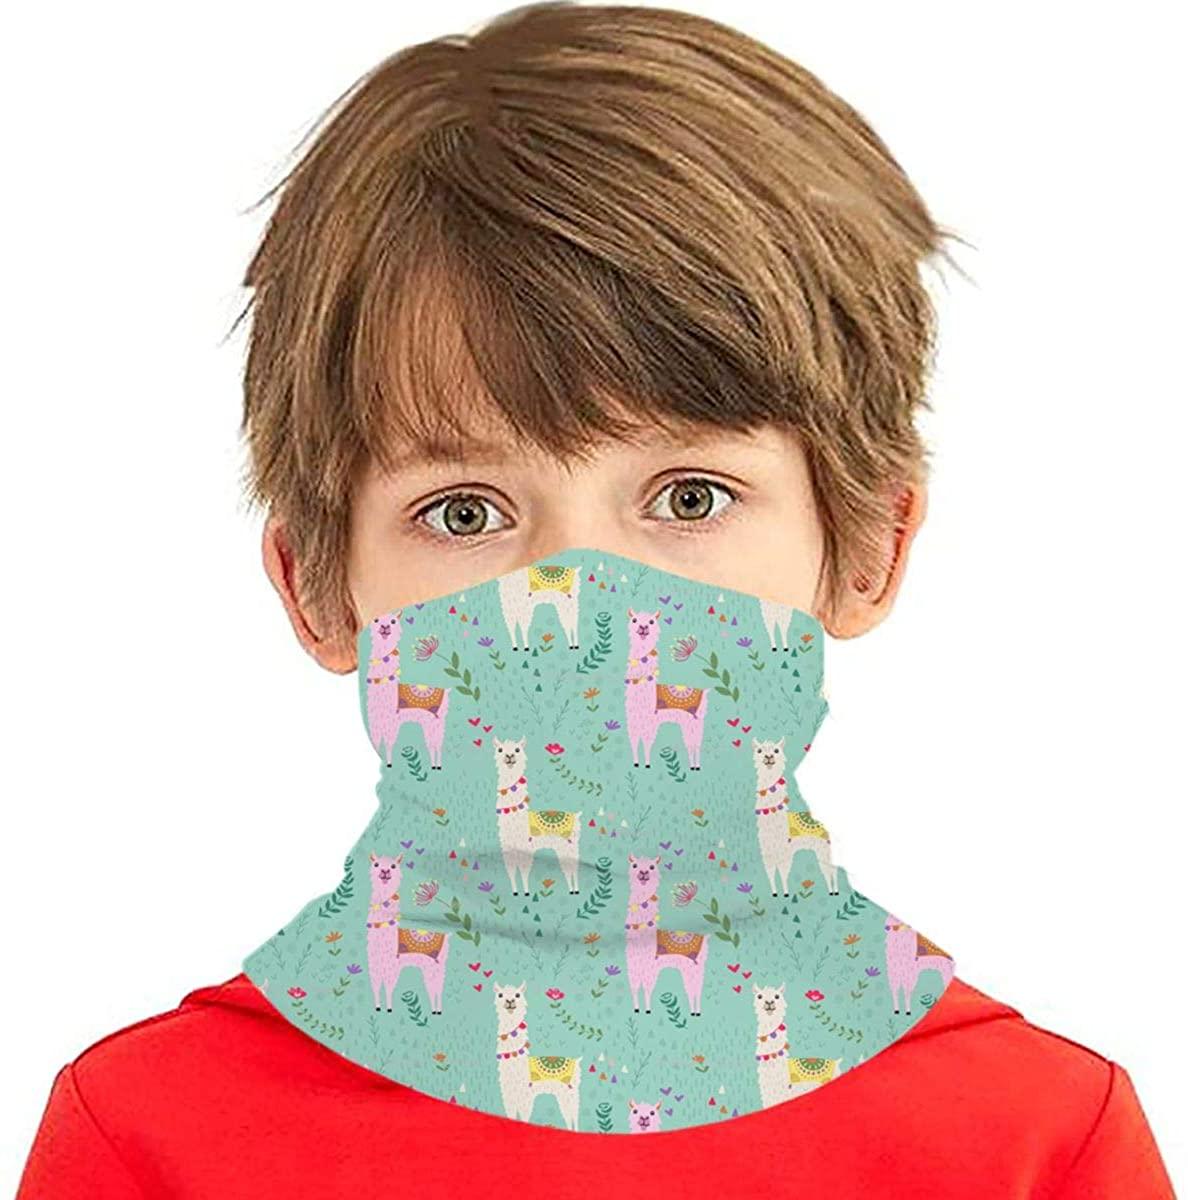 Youth Face Bandanas, Llama Reusable Face Mask Half Face Towel Mouth Cloth Facial Scarf Variety Headscarf